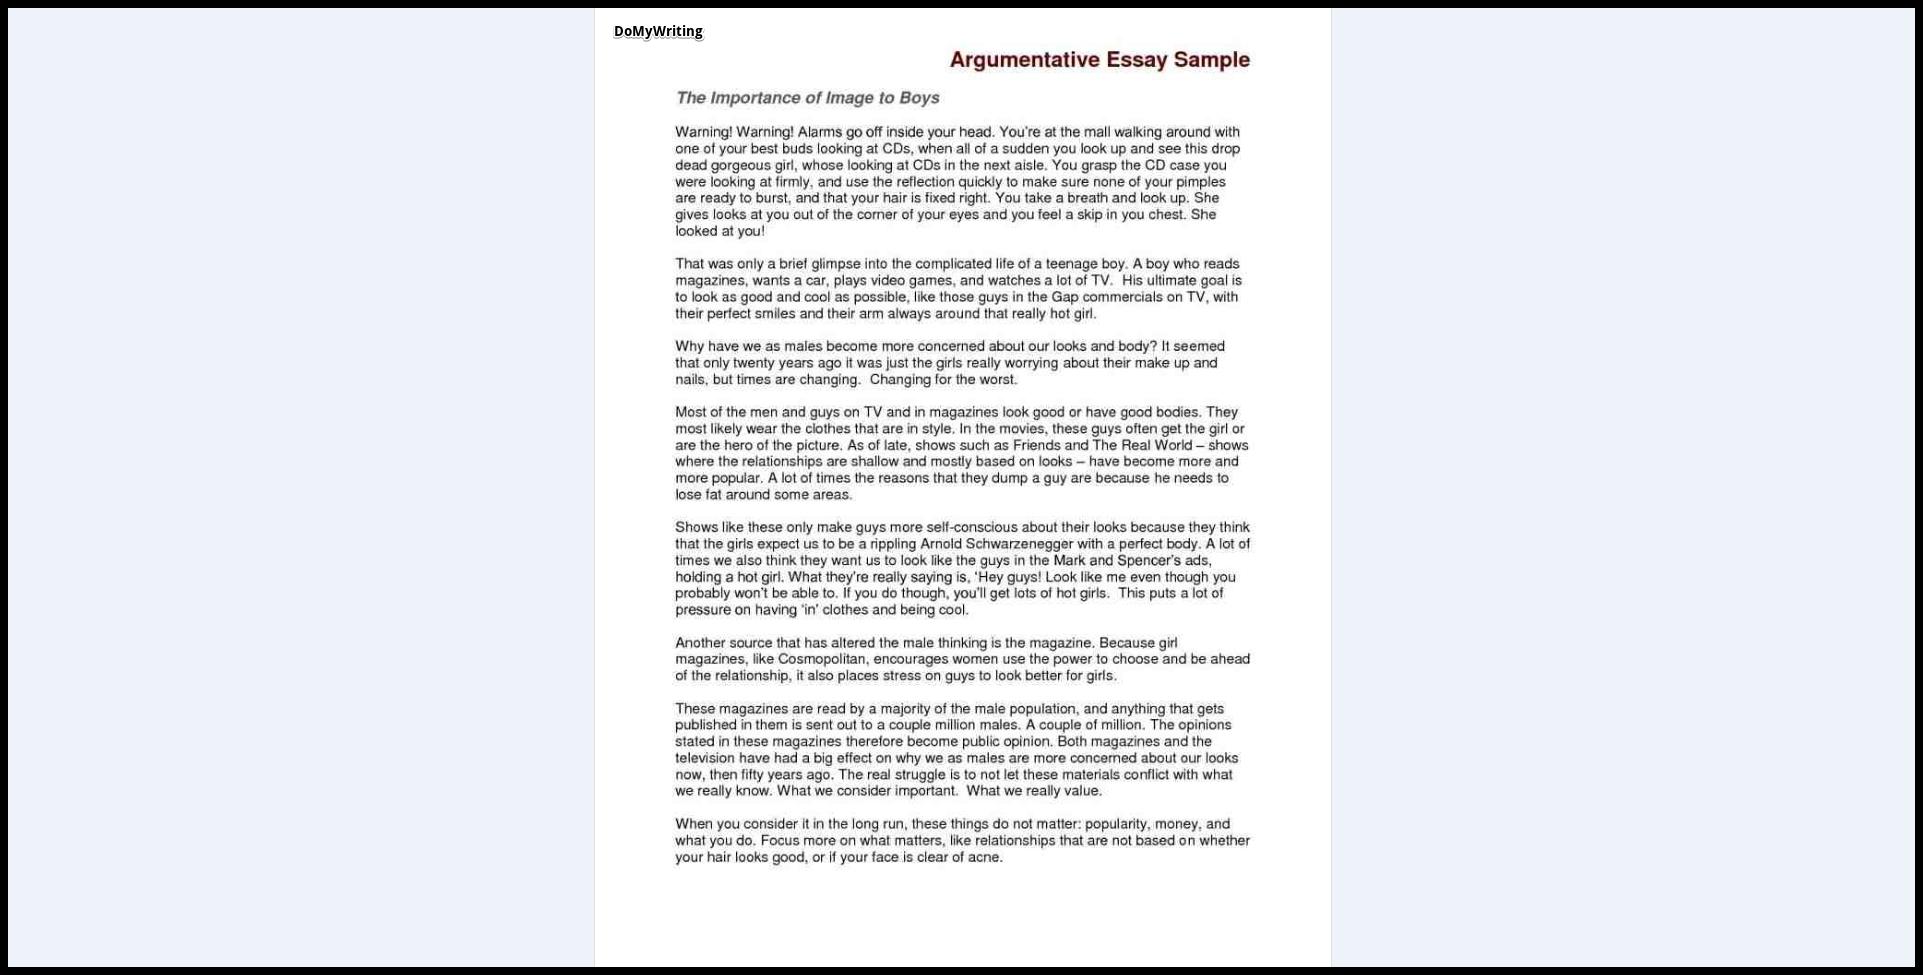 003 Essay Example Argumentative Sample Who Are Rare You Question Describe Full